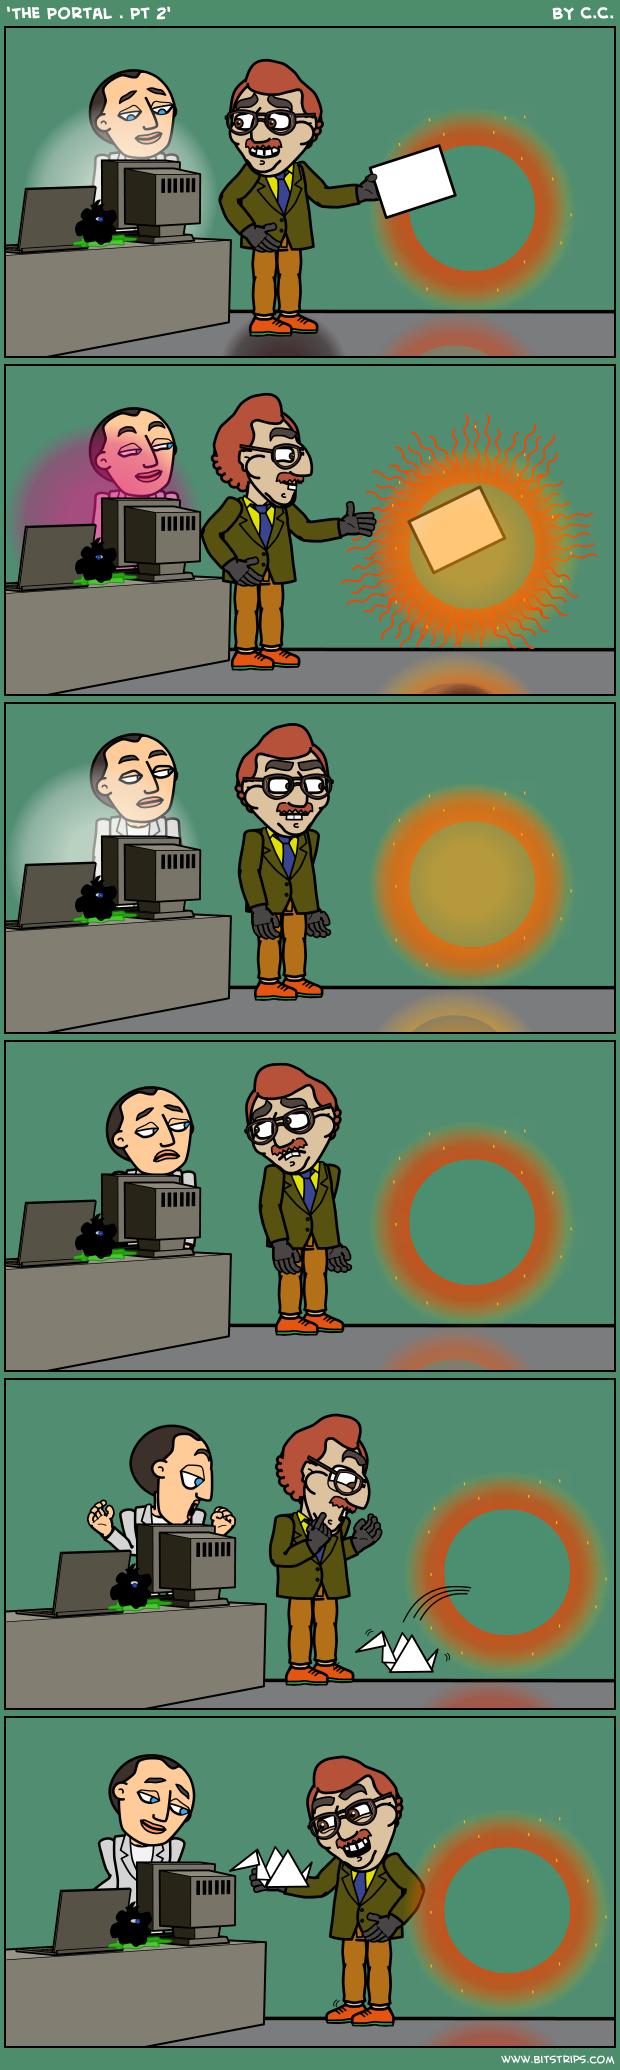 'The Portal . Pt 2'